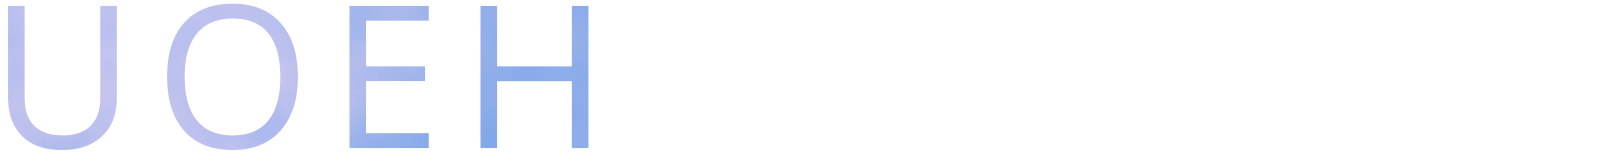 UOEH SOLUTIONS CO.Ltd.